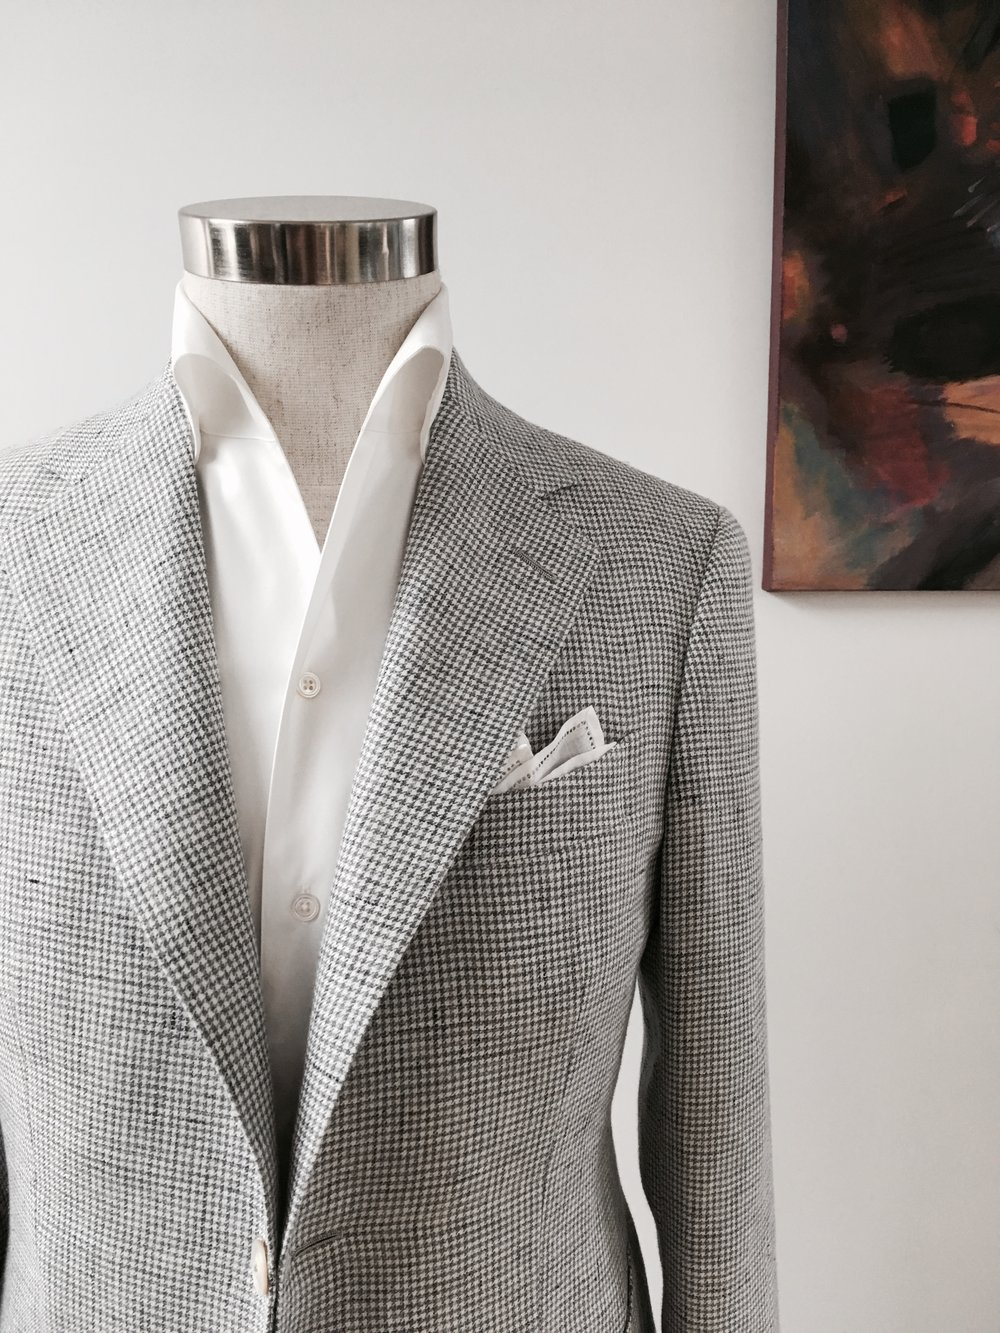 Magnus & Novus - Bespoke Tailored Summer Leisure Jacket & Suits Hong Kong